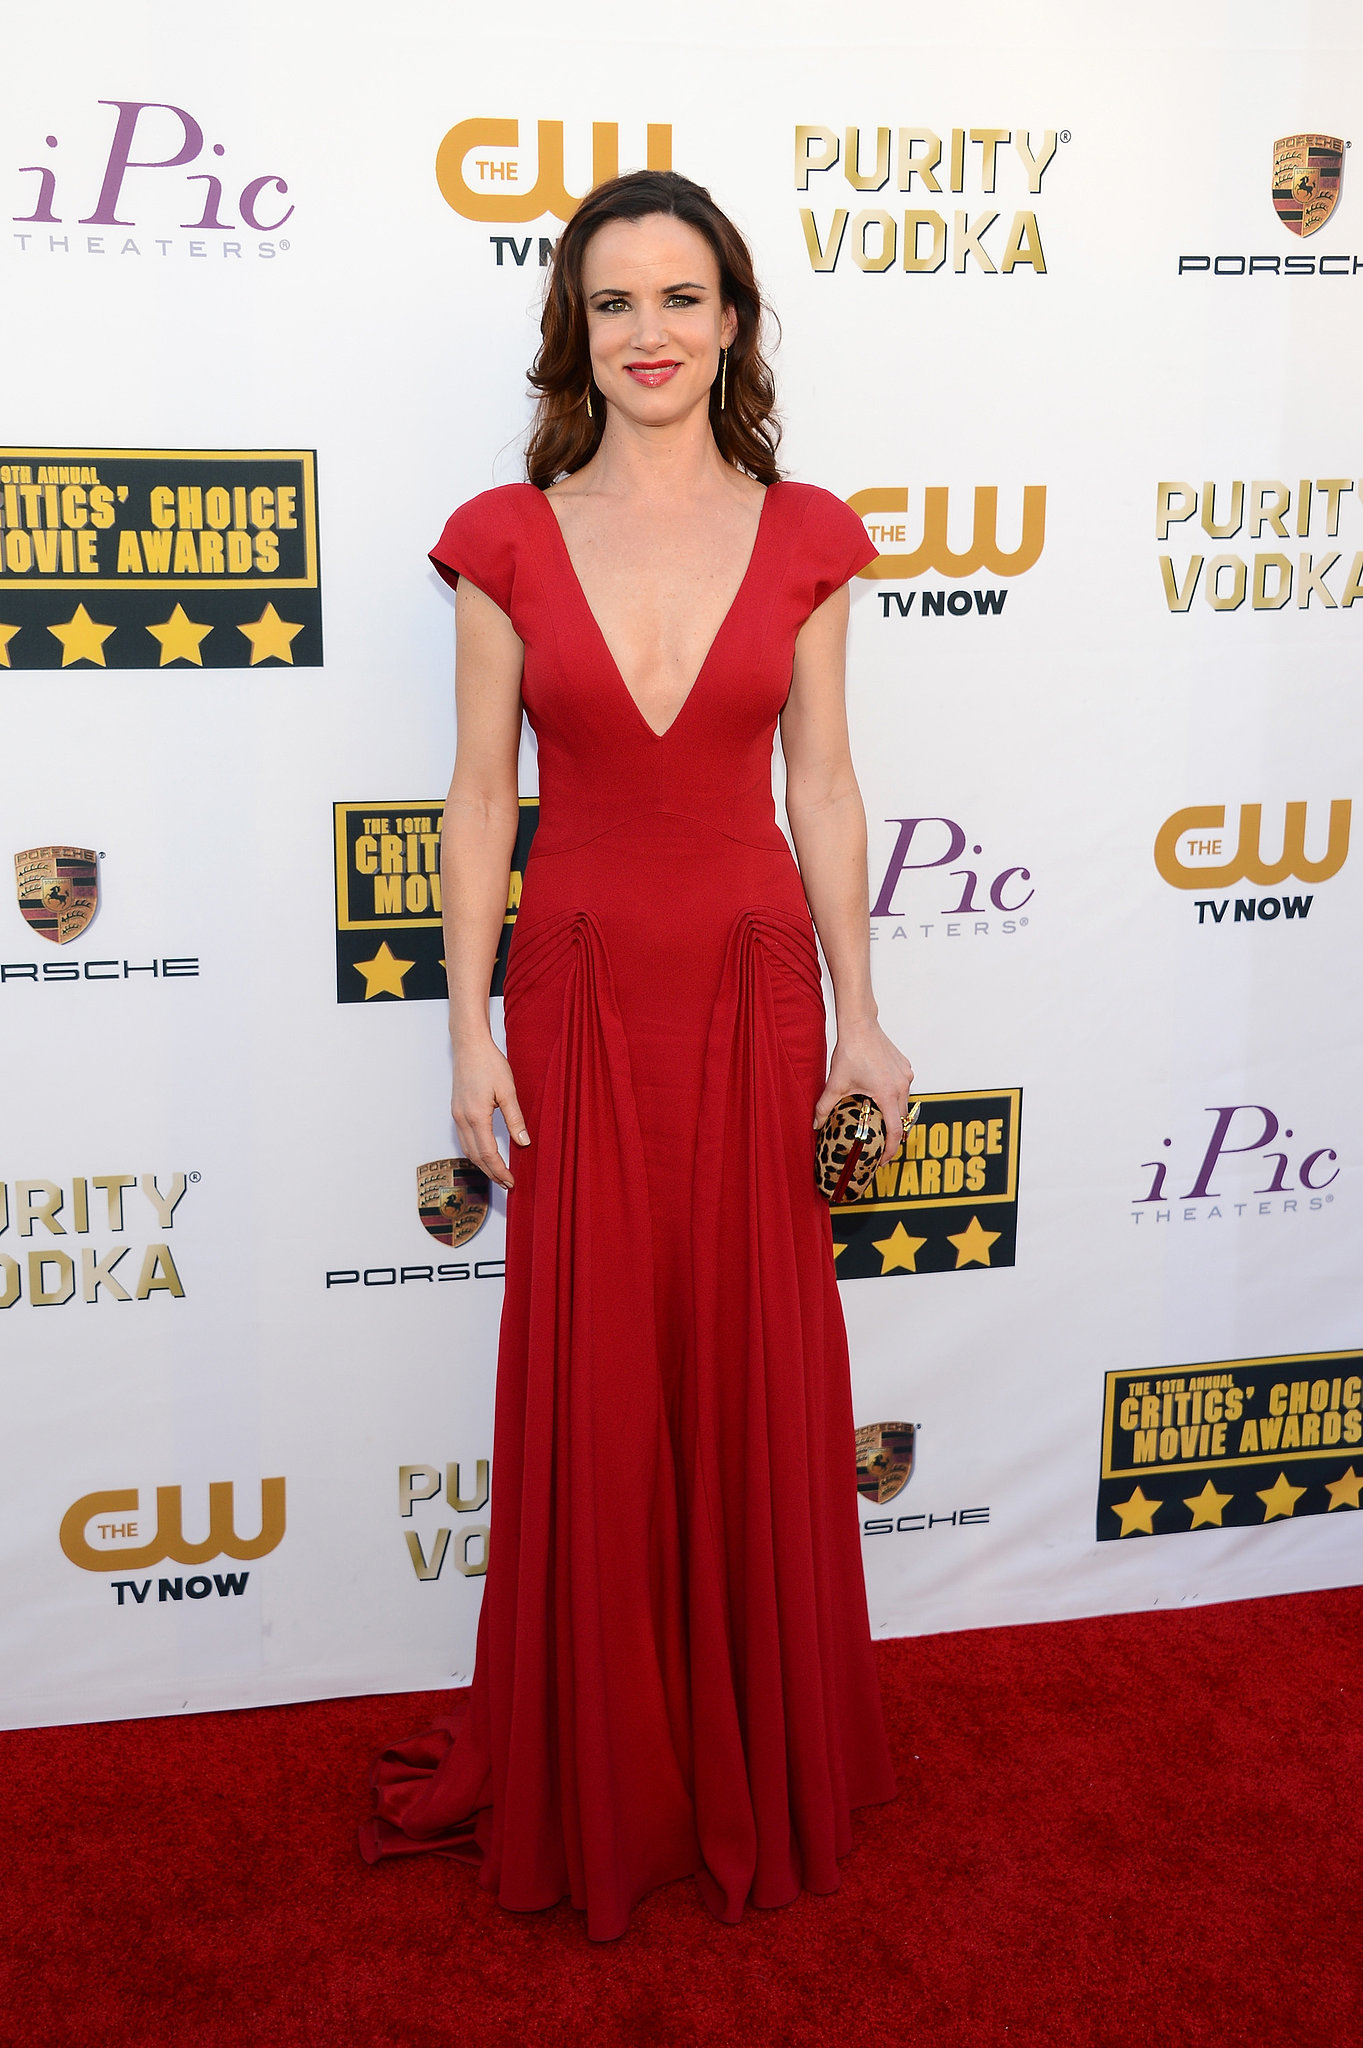 Juliette Lewis at the Critics' Choice Awards 2014